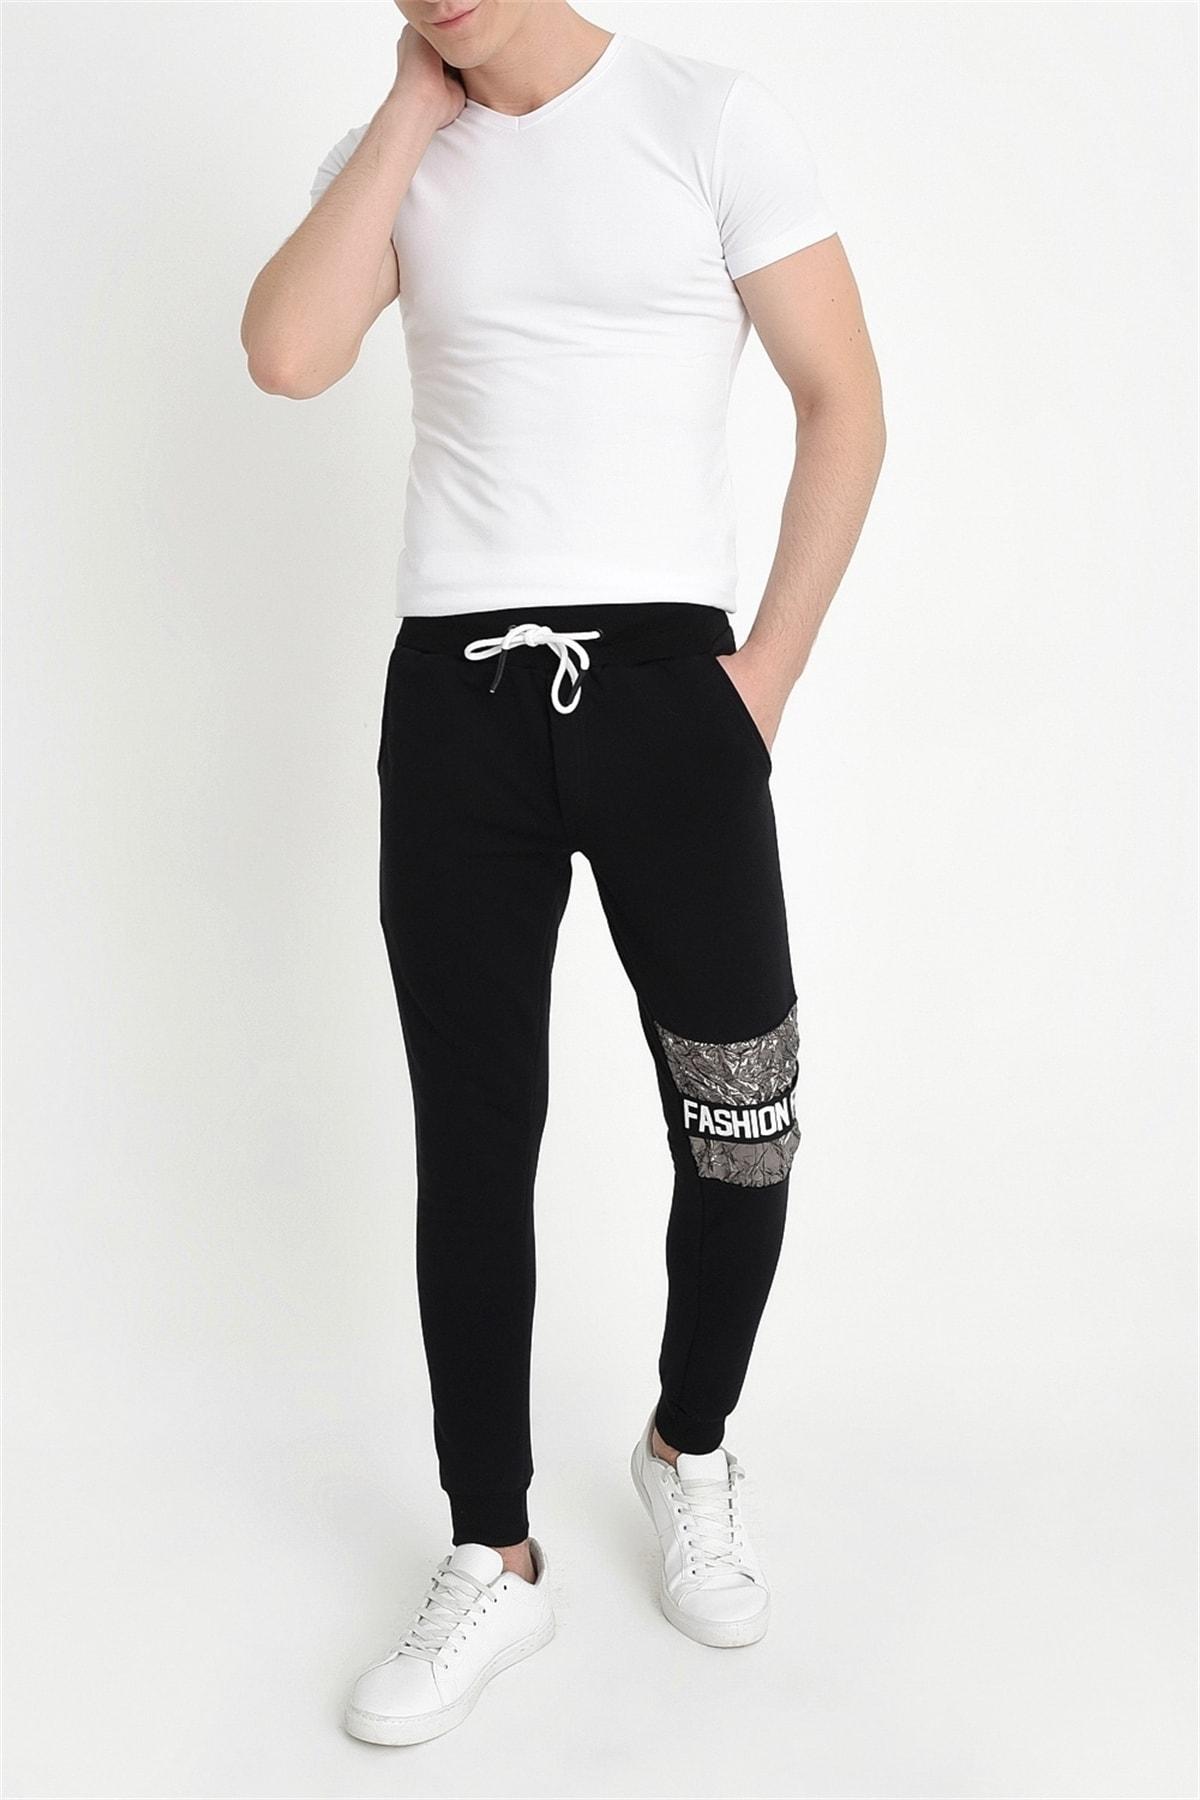 Efor Atp 011 Slim Fit Siyah Spor Pantolon 2